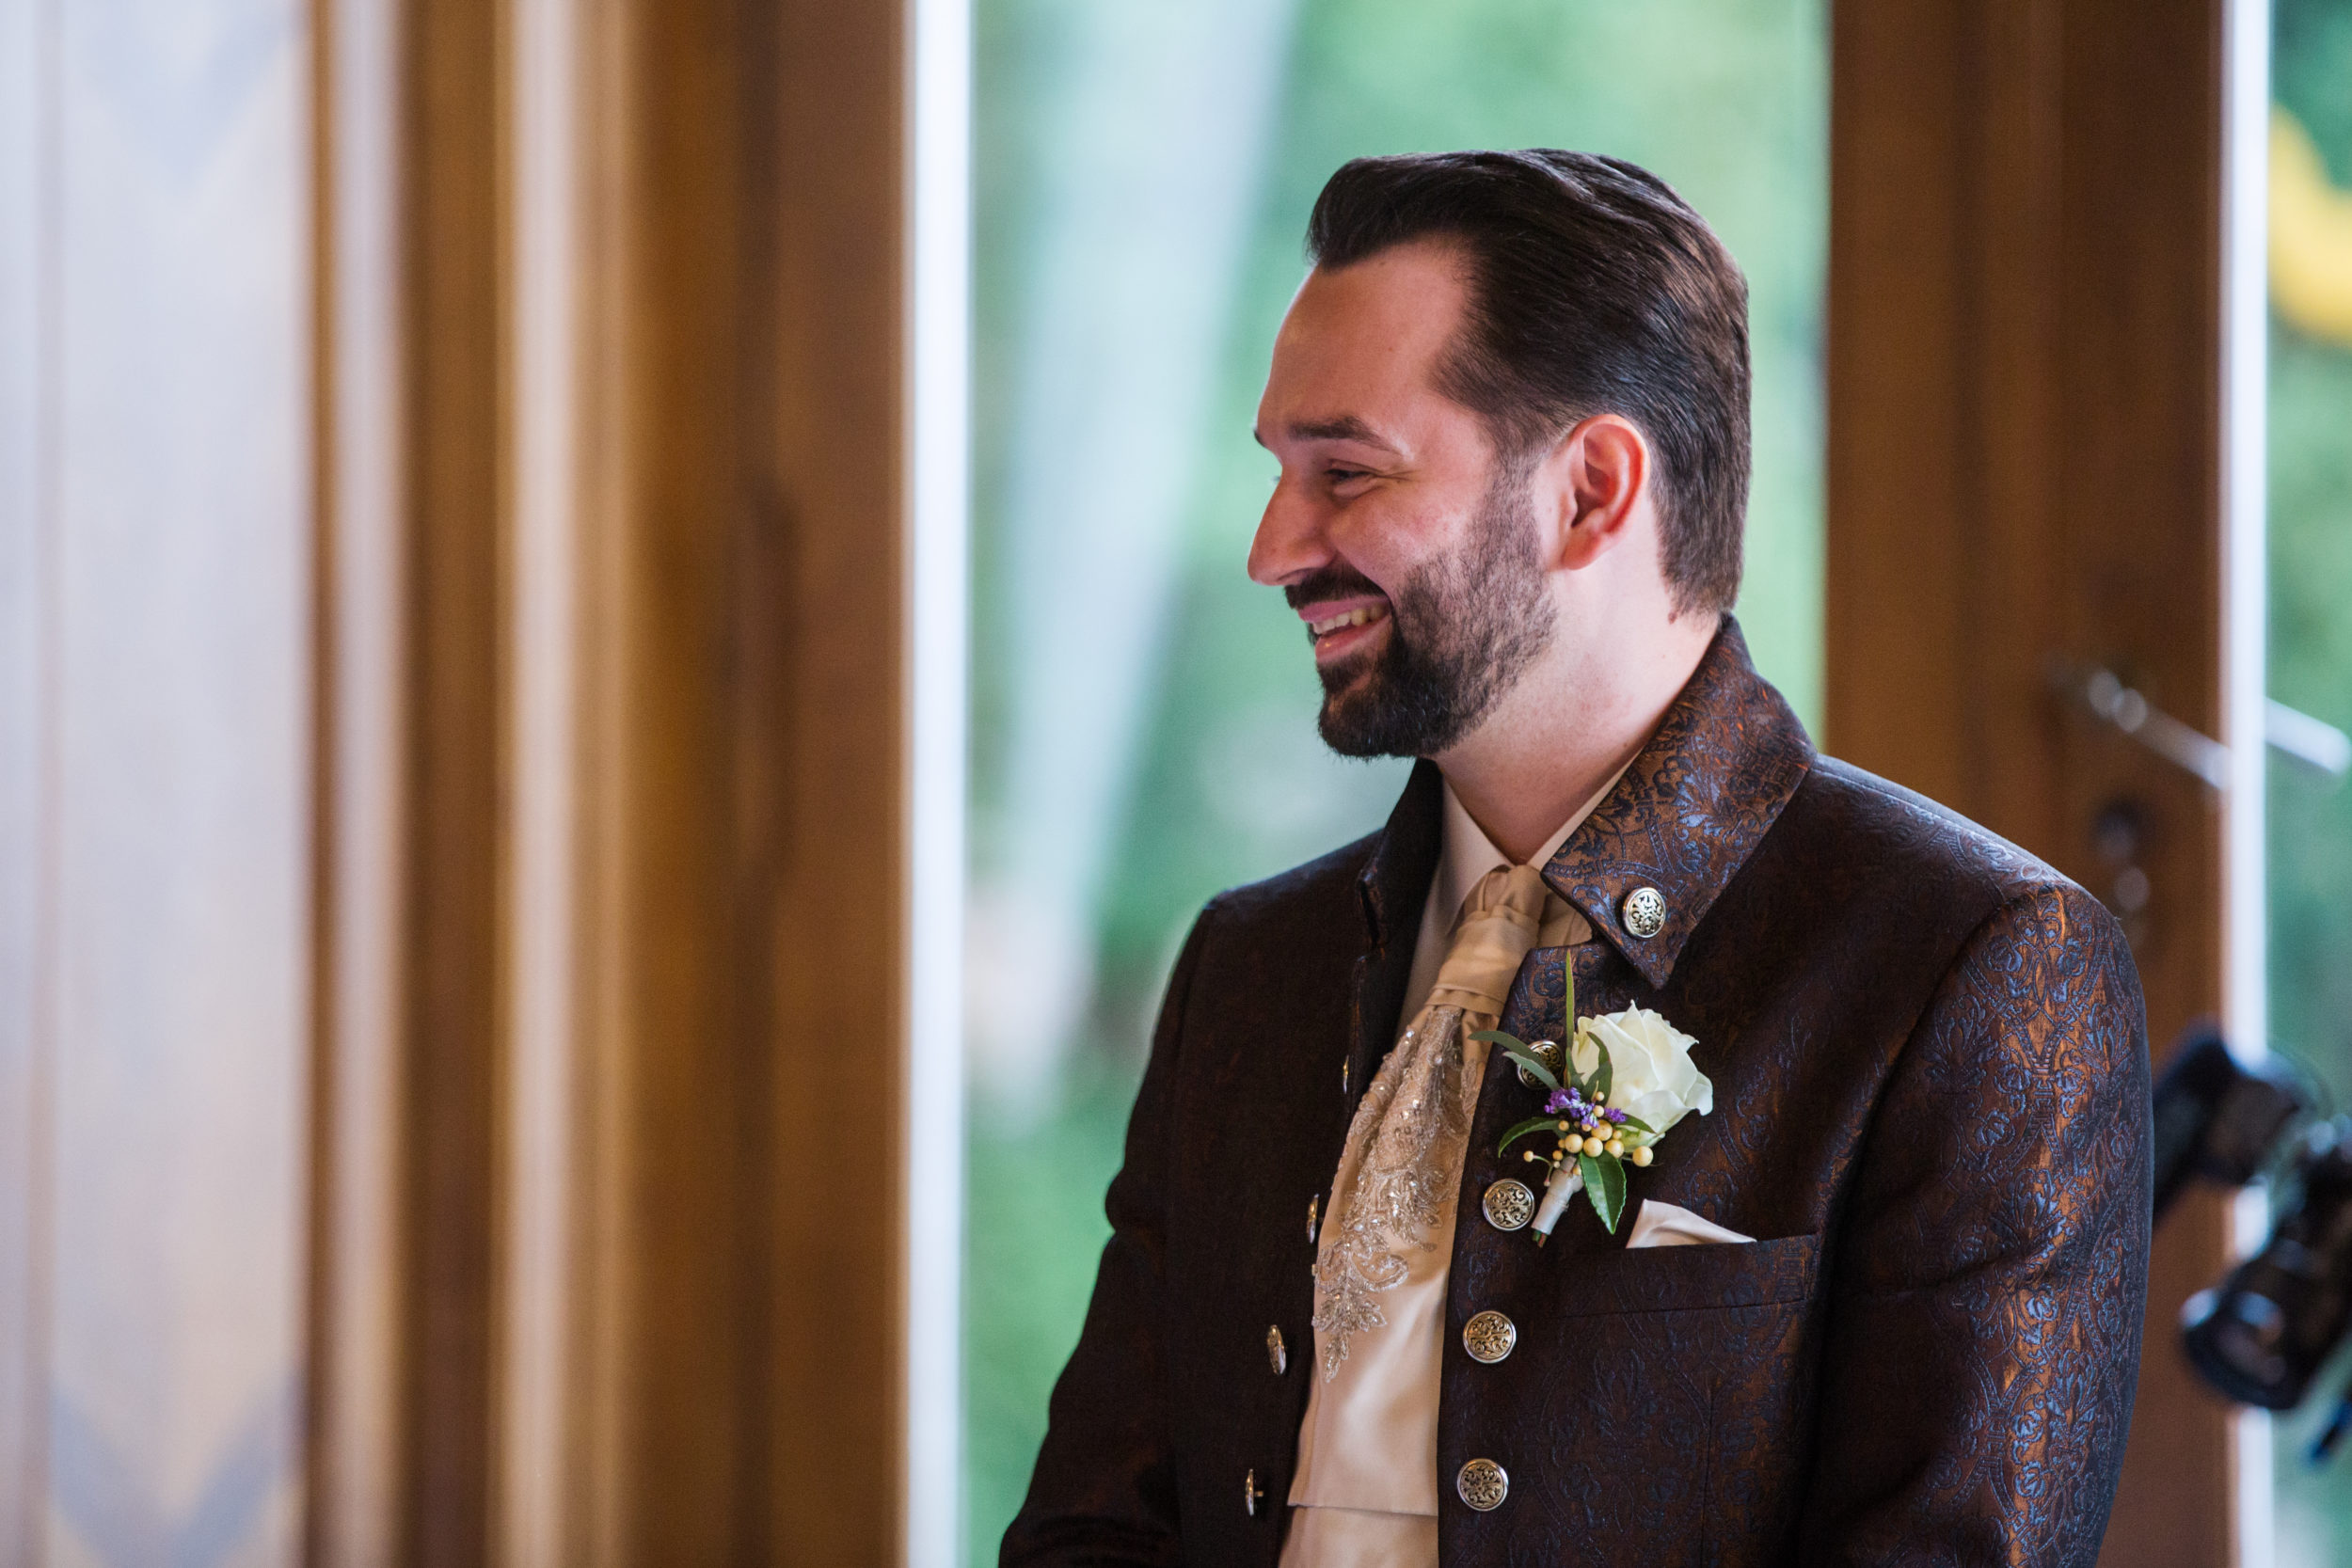 Myrelle Couture Marina Deynega Brautmode Hochzeit Anzug Massgeschneidert Royal Wedding Cm 01